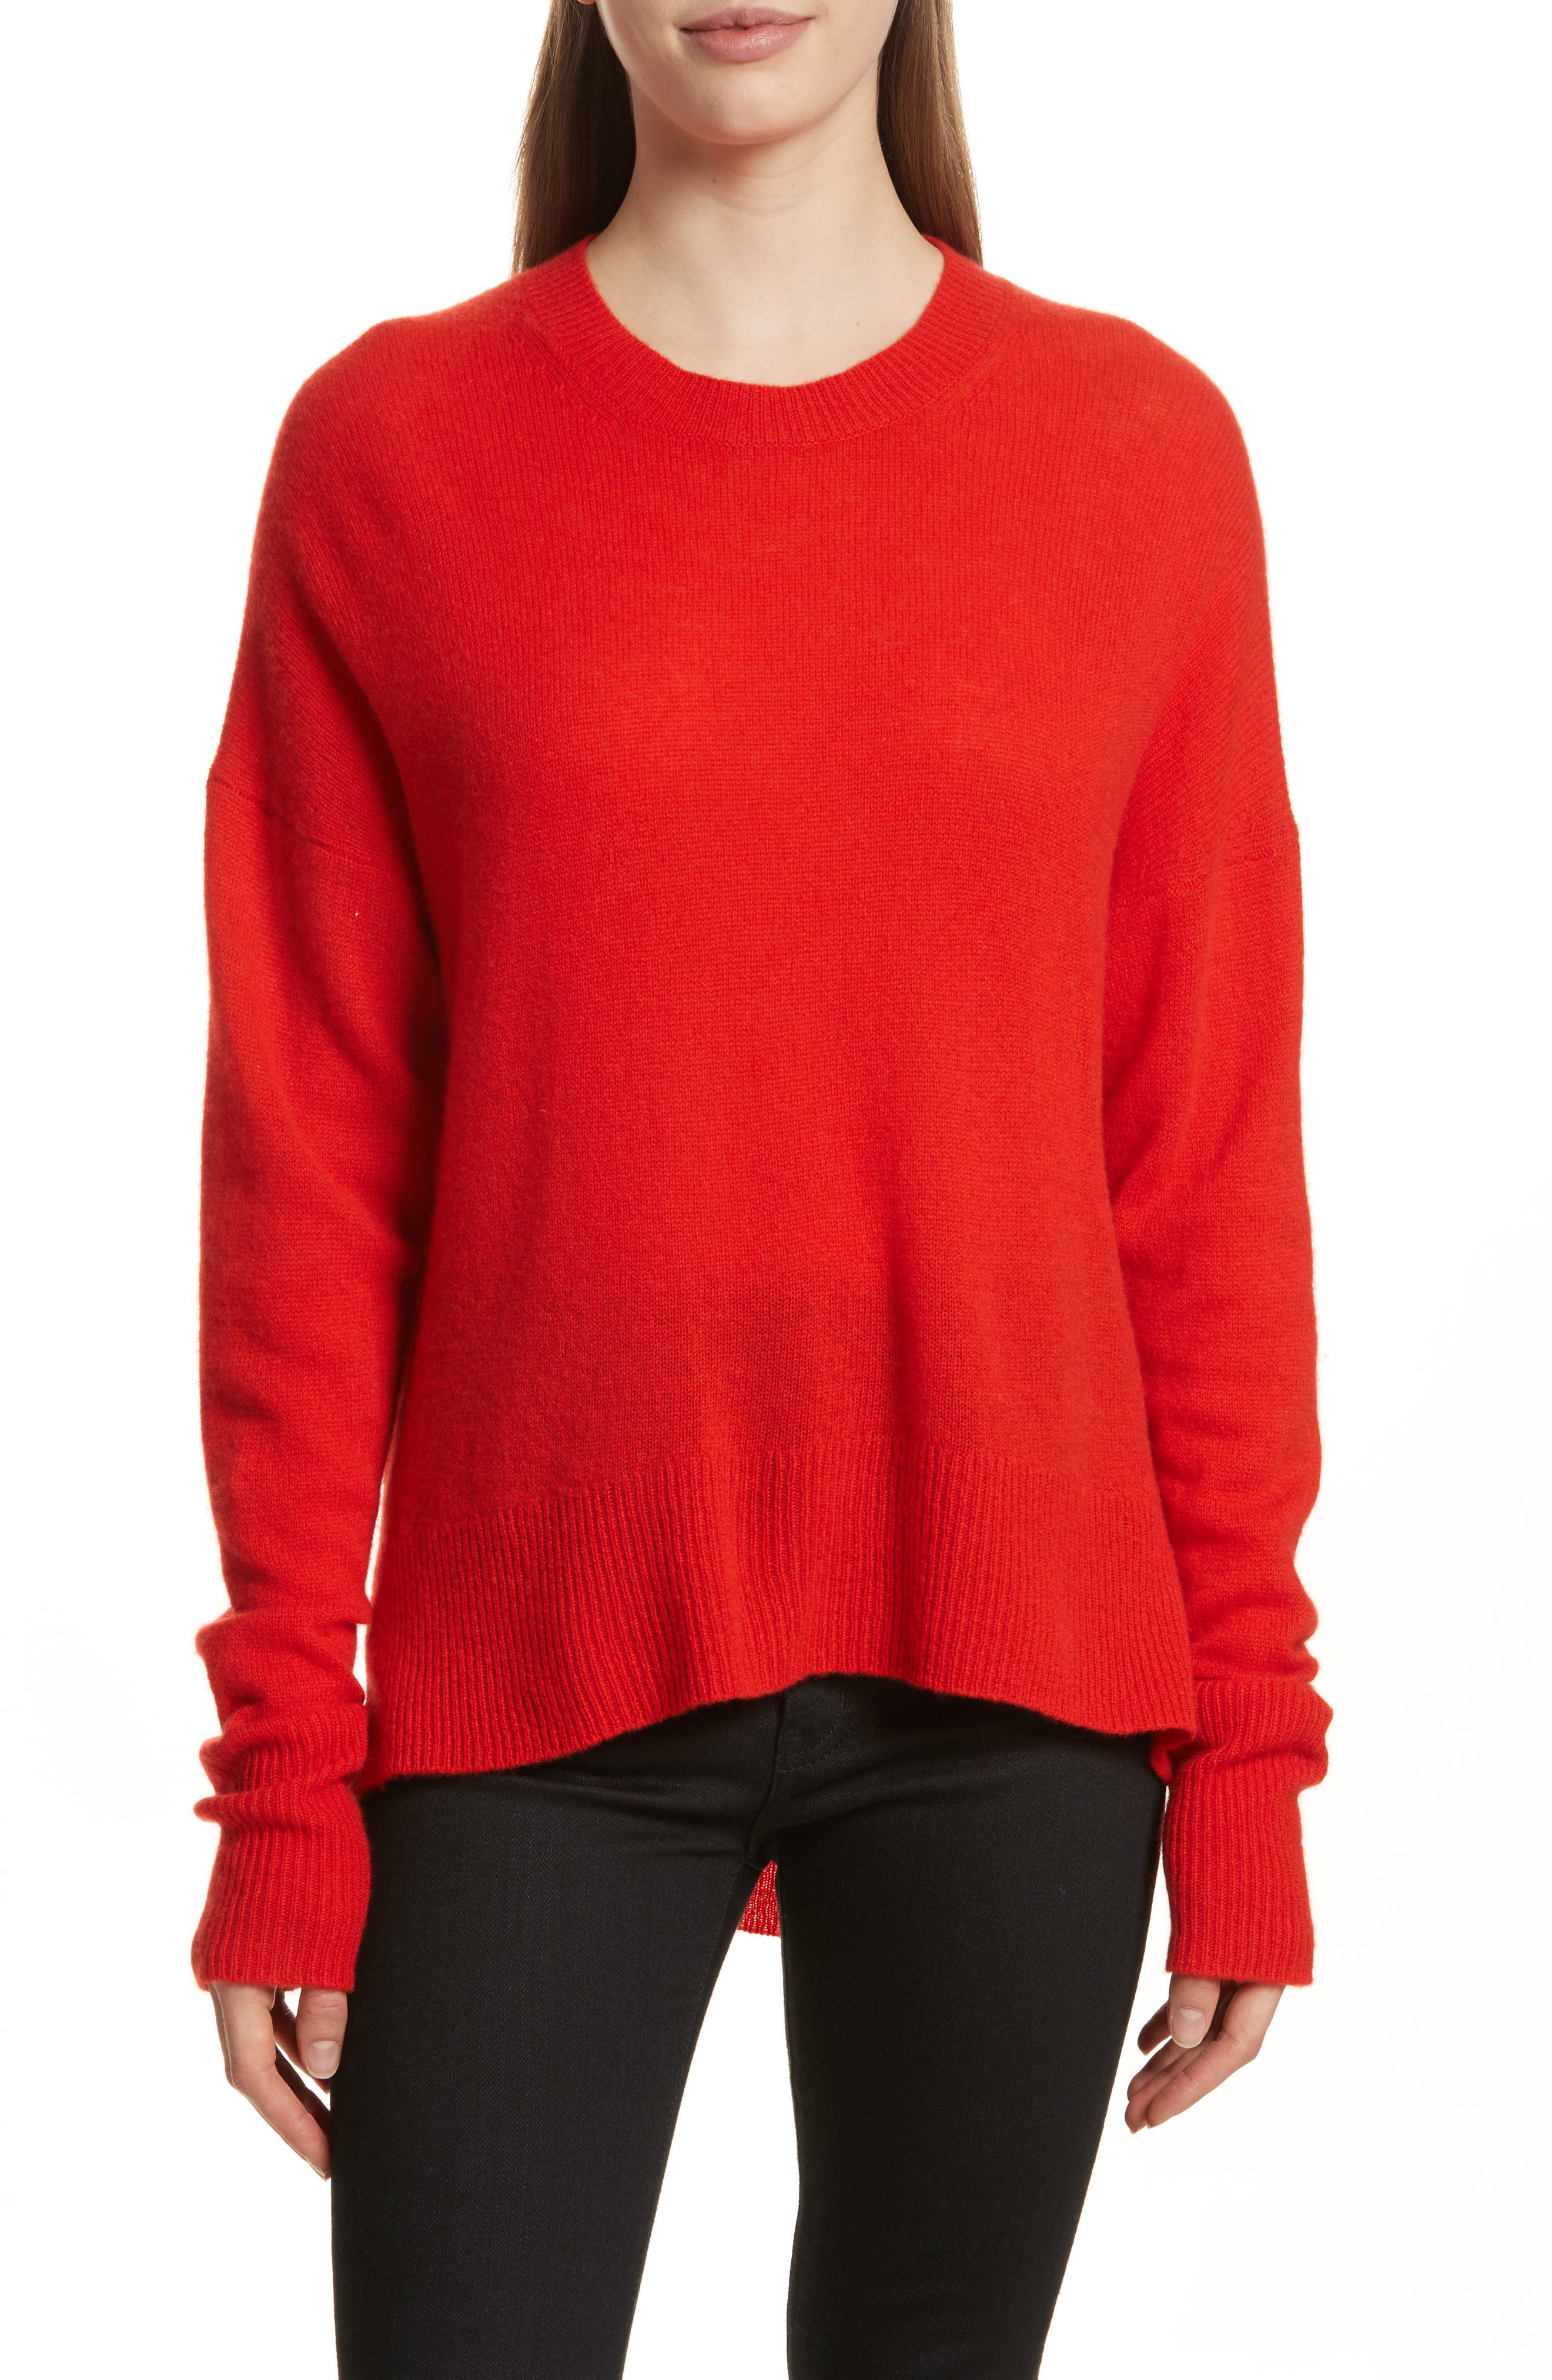 Karenia L Cashmere Sweater,                             Main thumbnail 4, color,